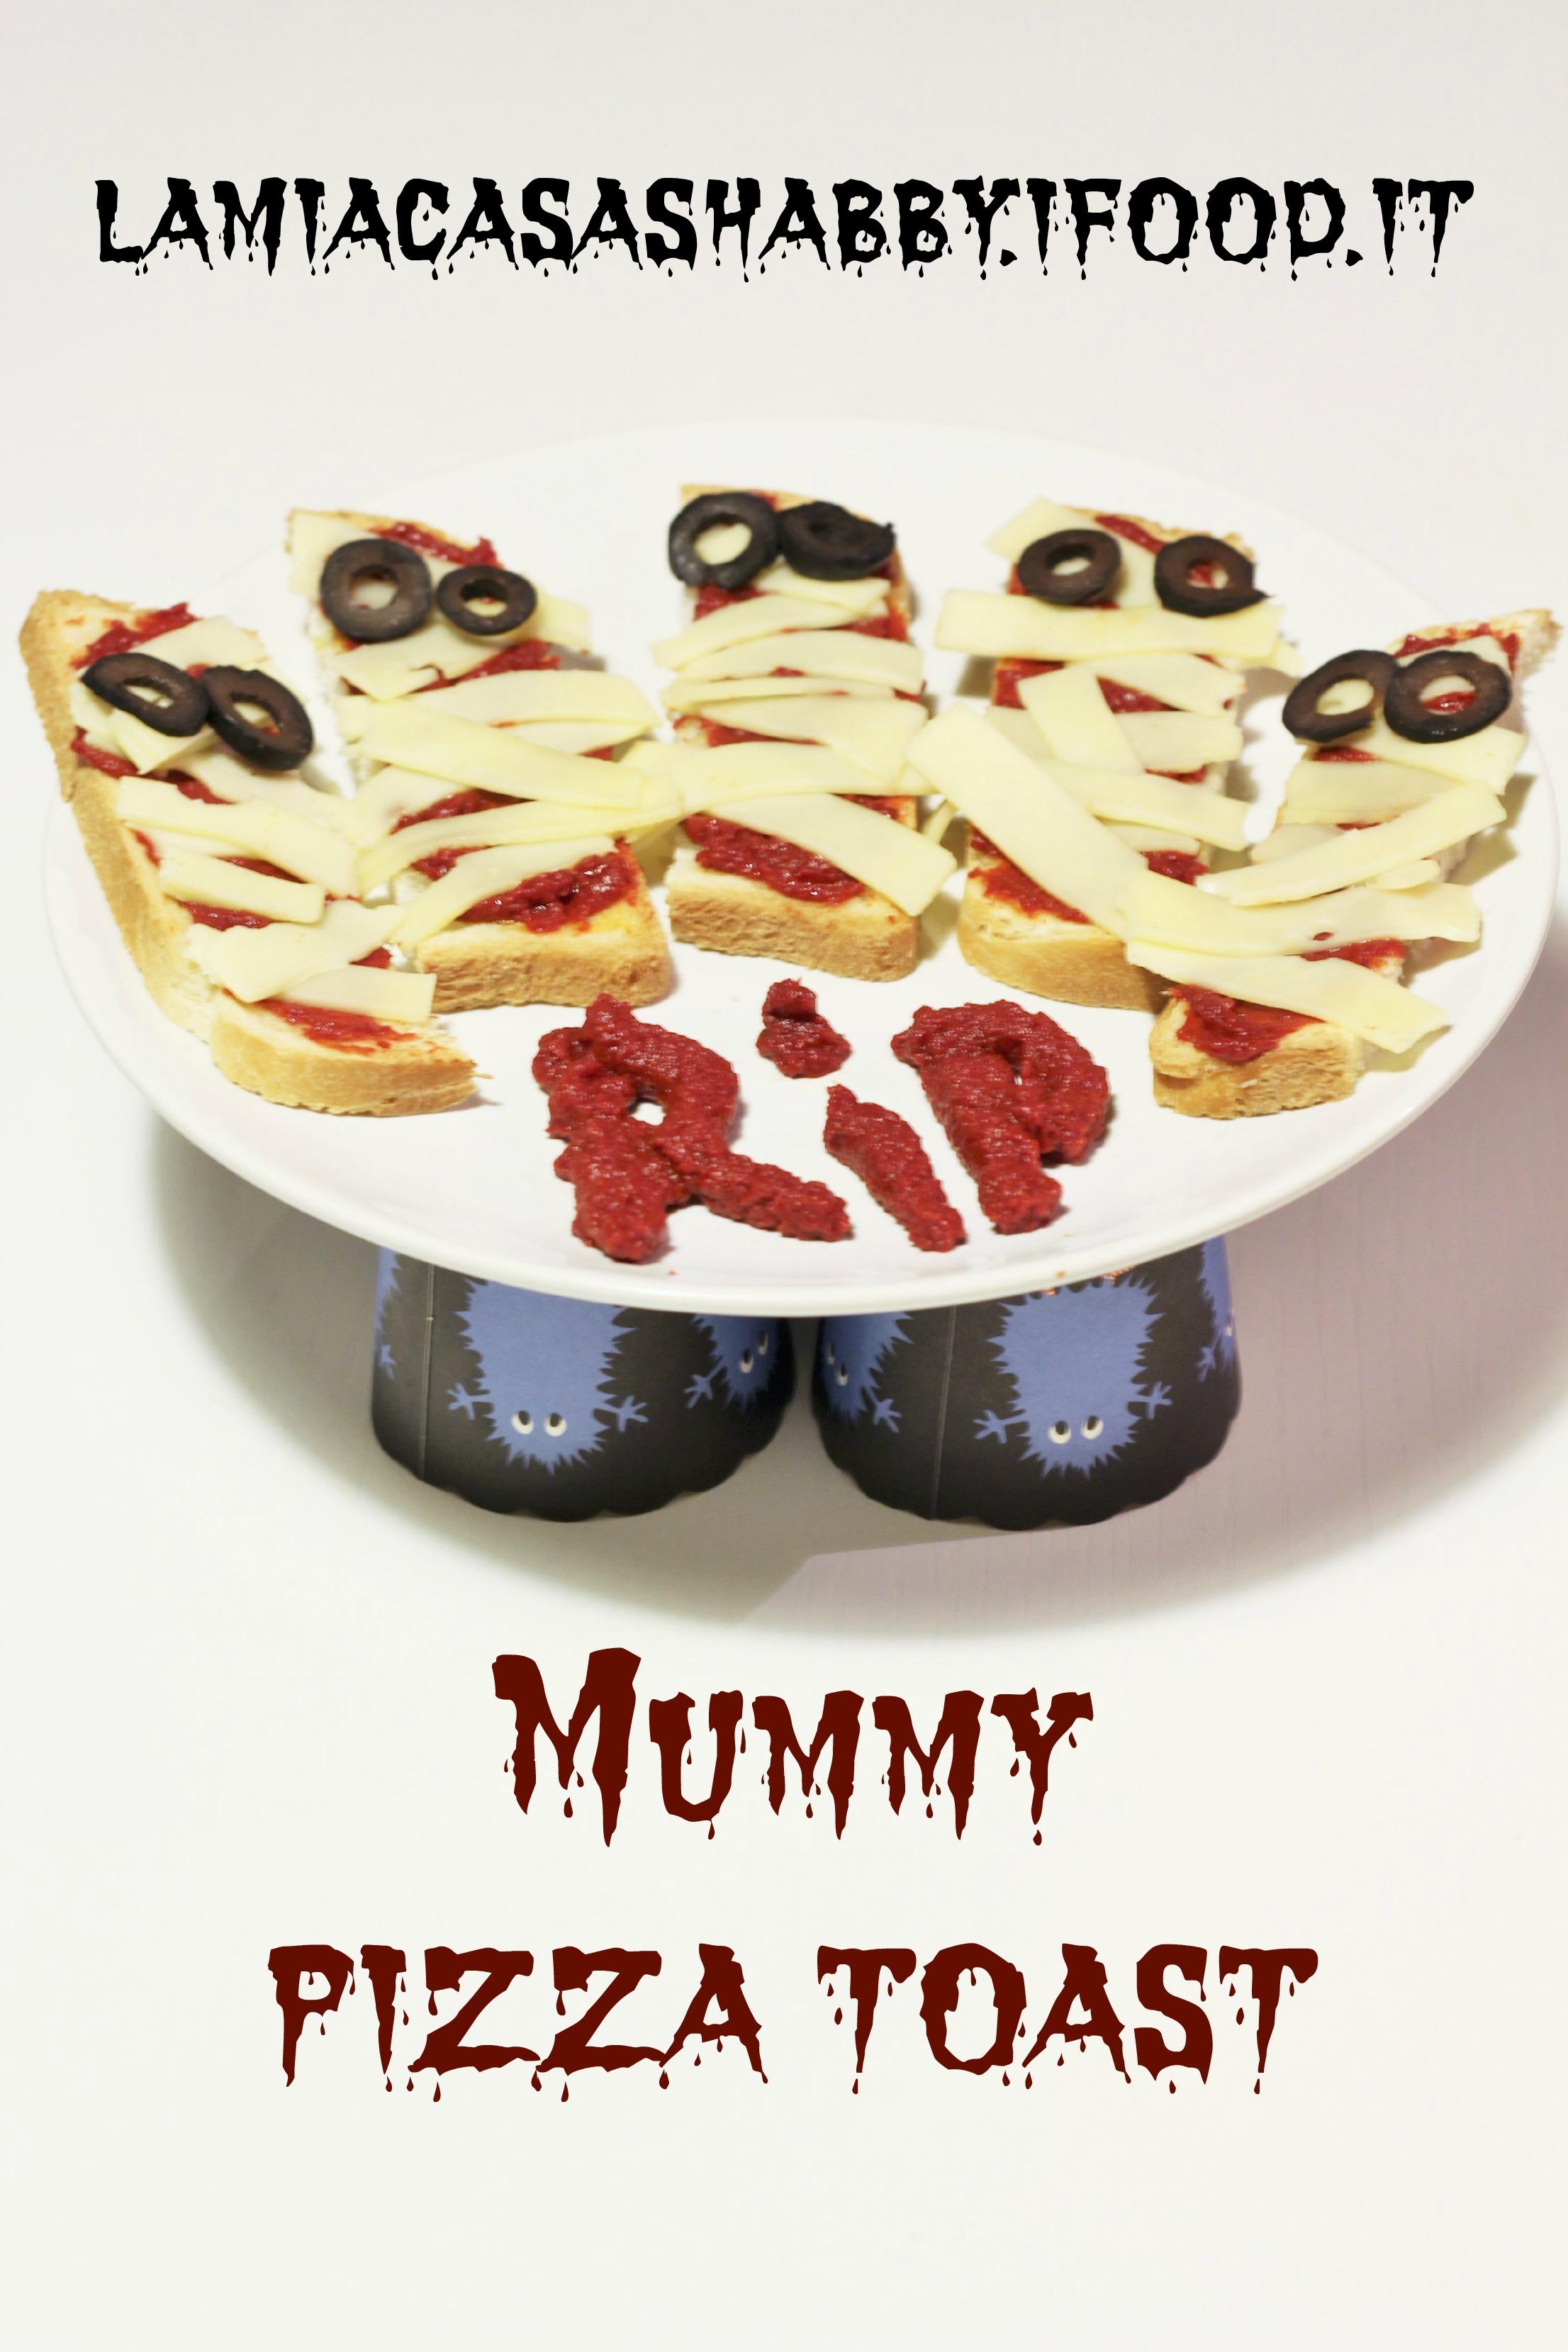 mummypizzatoastverticale